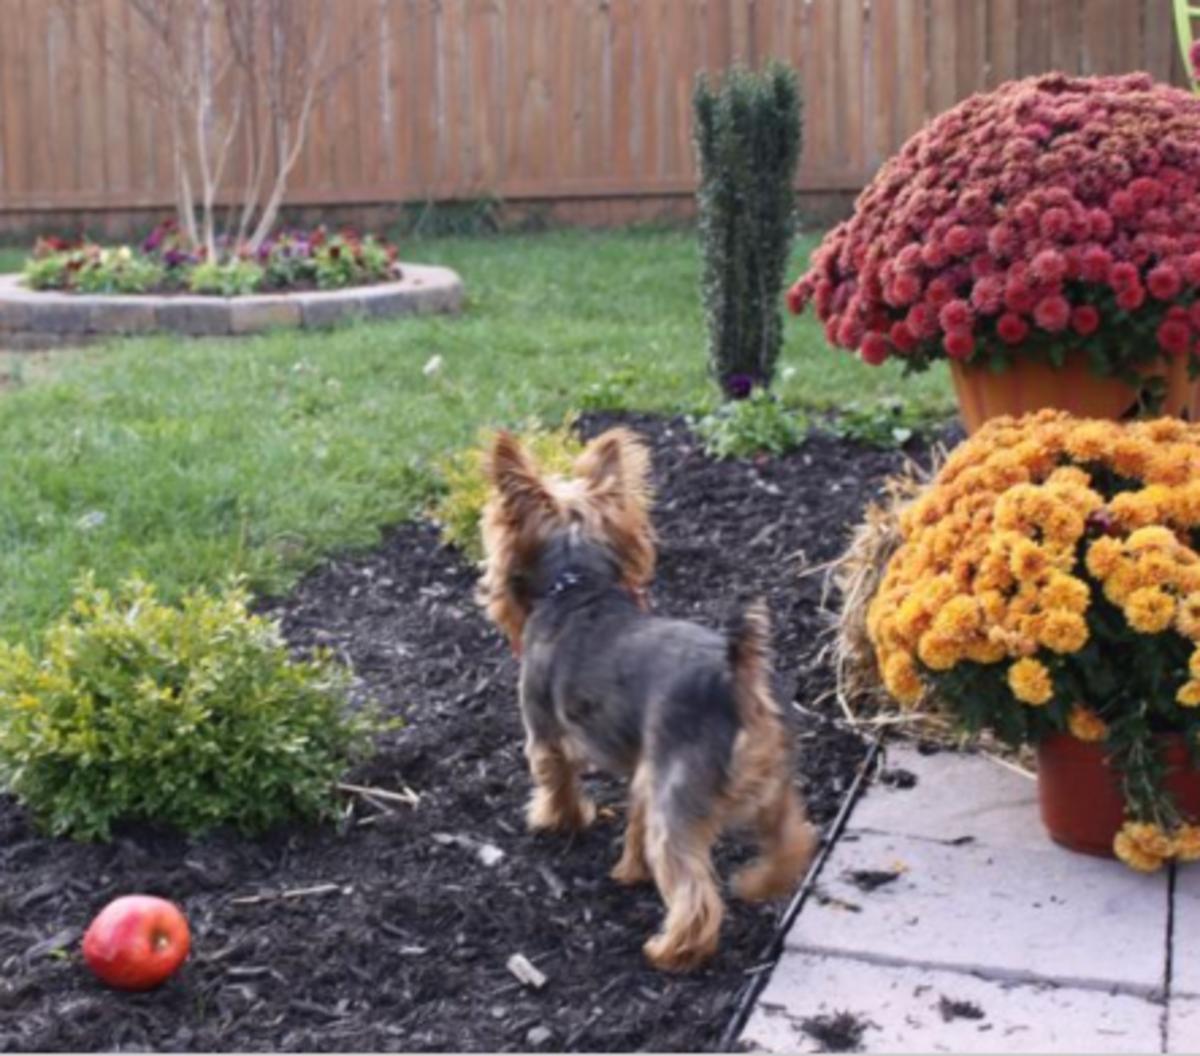 dog digging plants